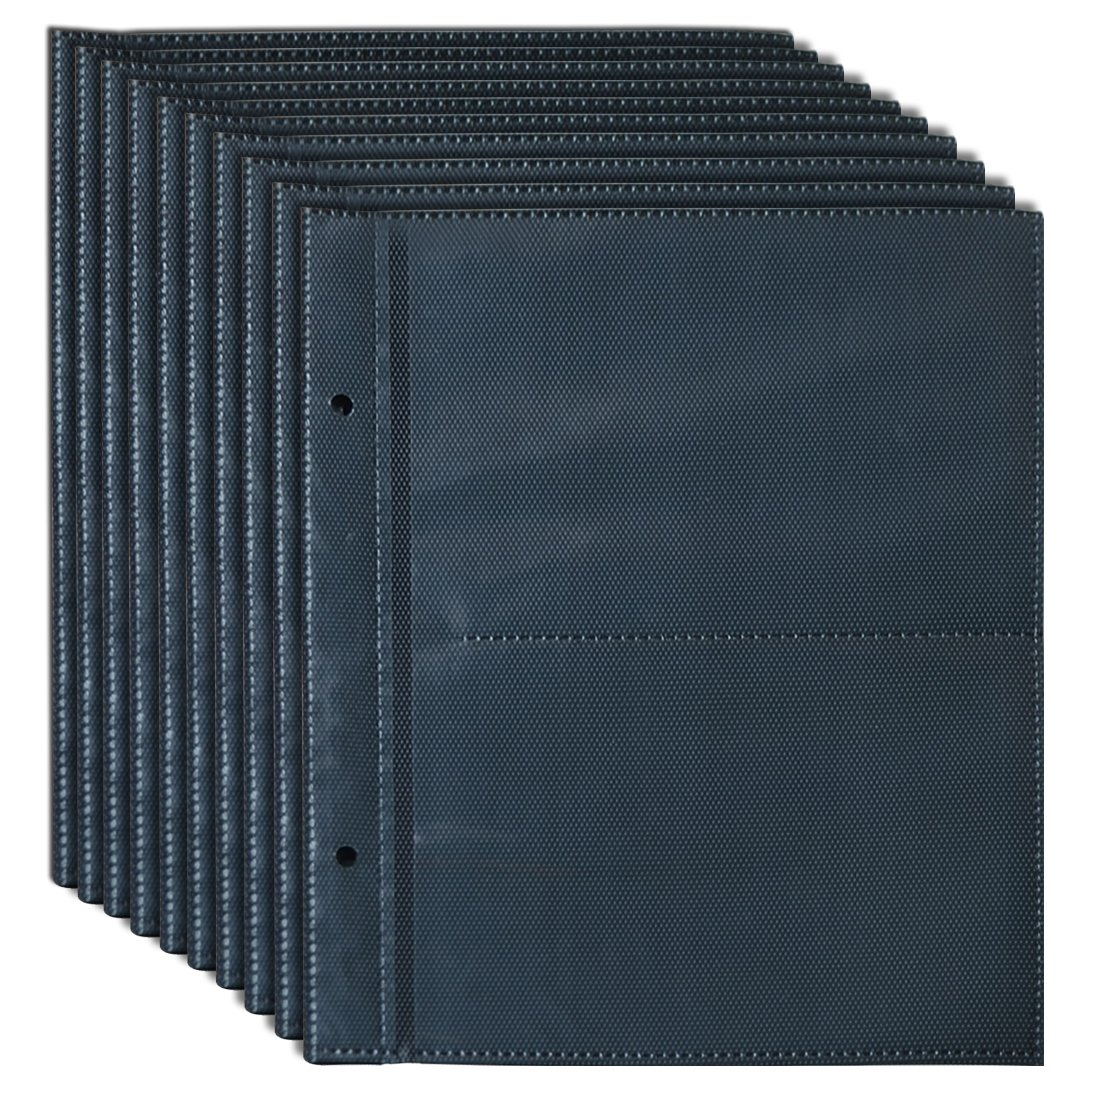 Giftgarden Hojas de Álbum con Fundas,10 x 15 cm para 40 Fotos Sainthood PA122301